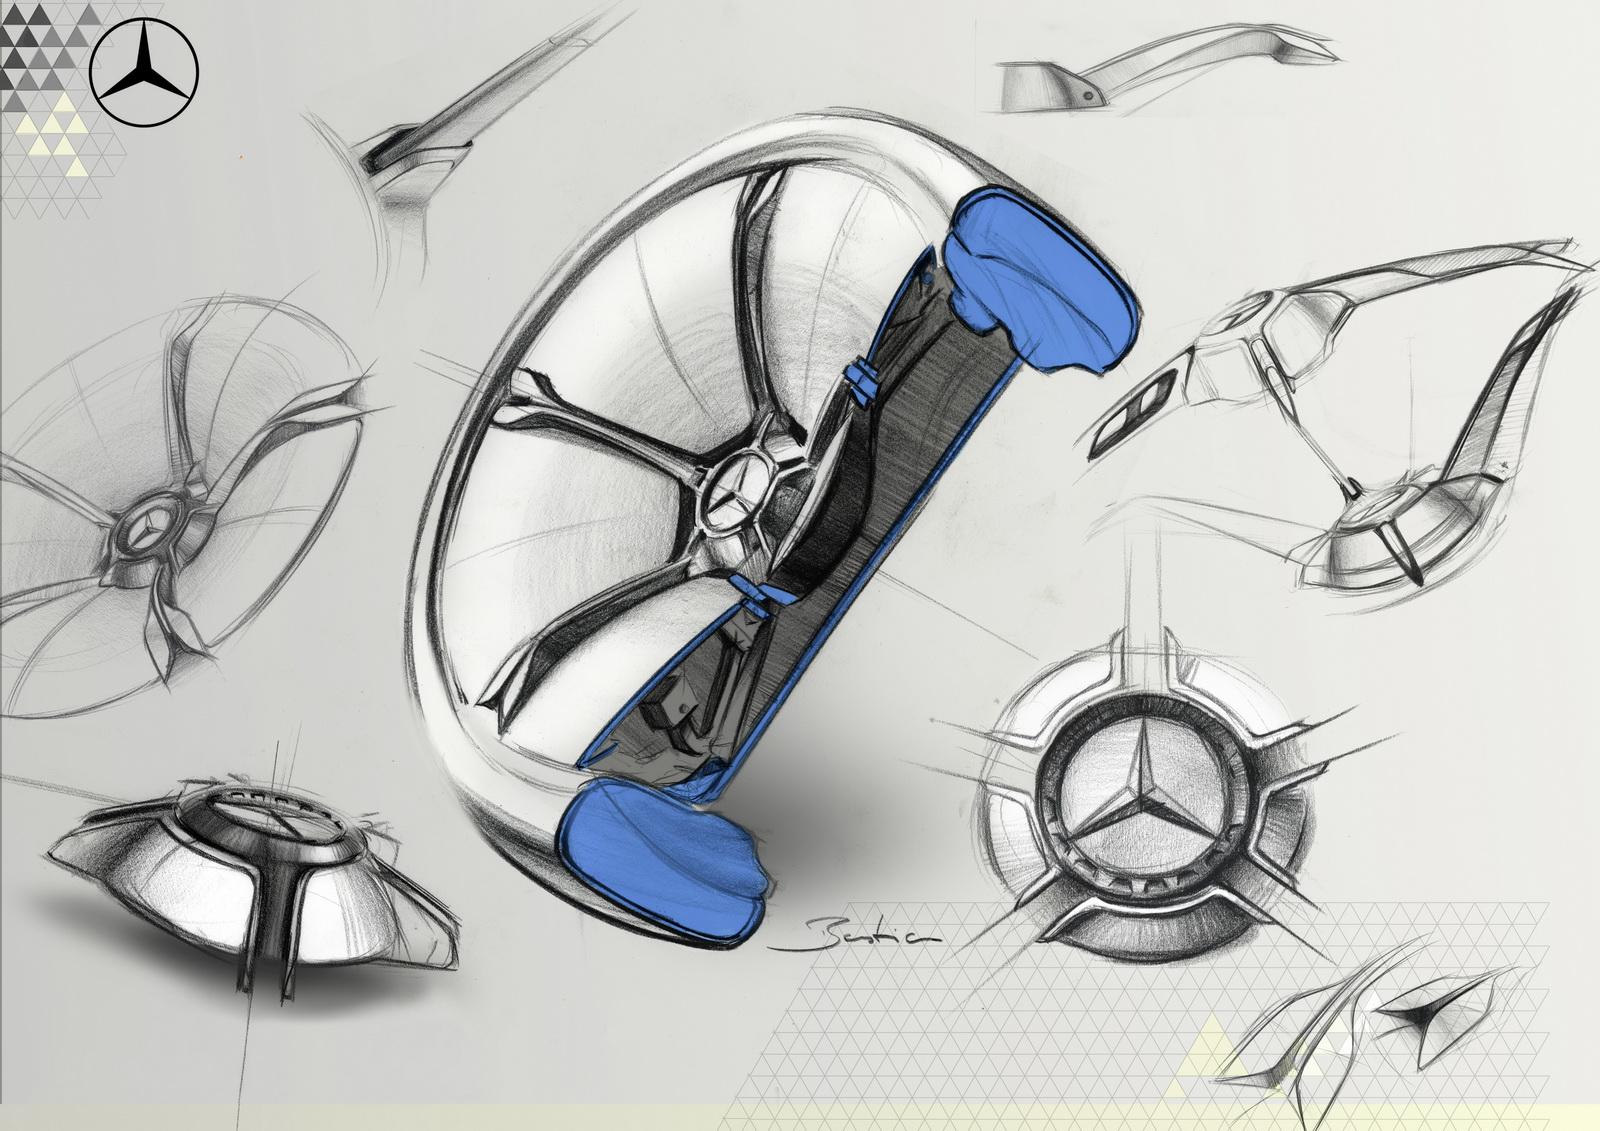 http://www.carstyling.ru/resources/concept/2015-Mercedes-Benz-Concept-IAA-Design-Sketch-06.jpg